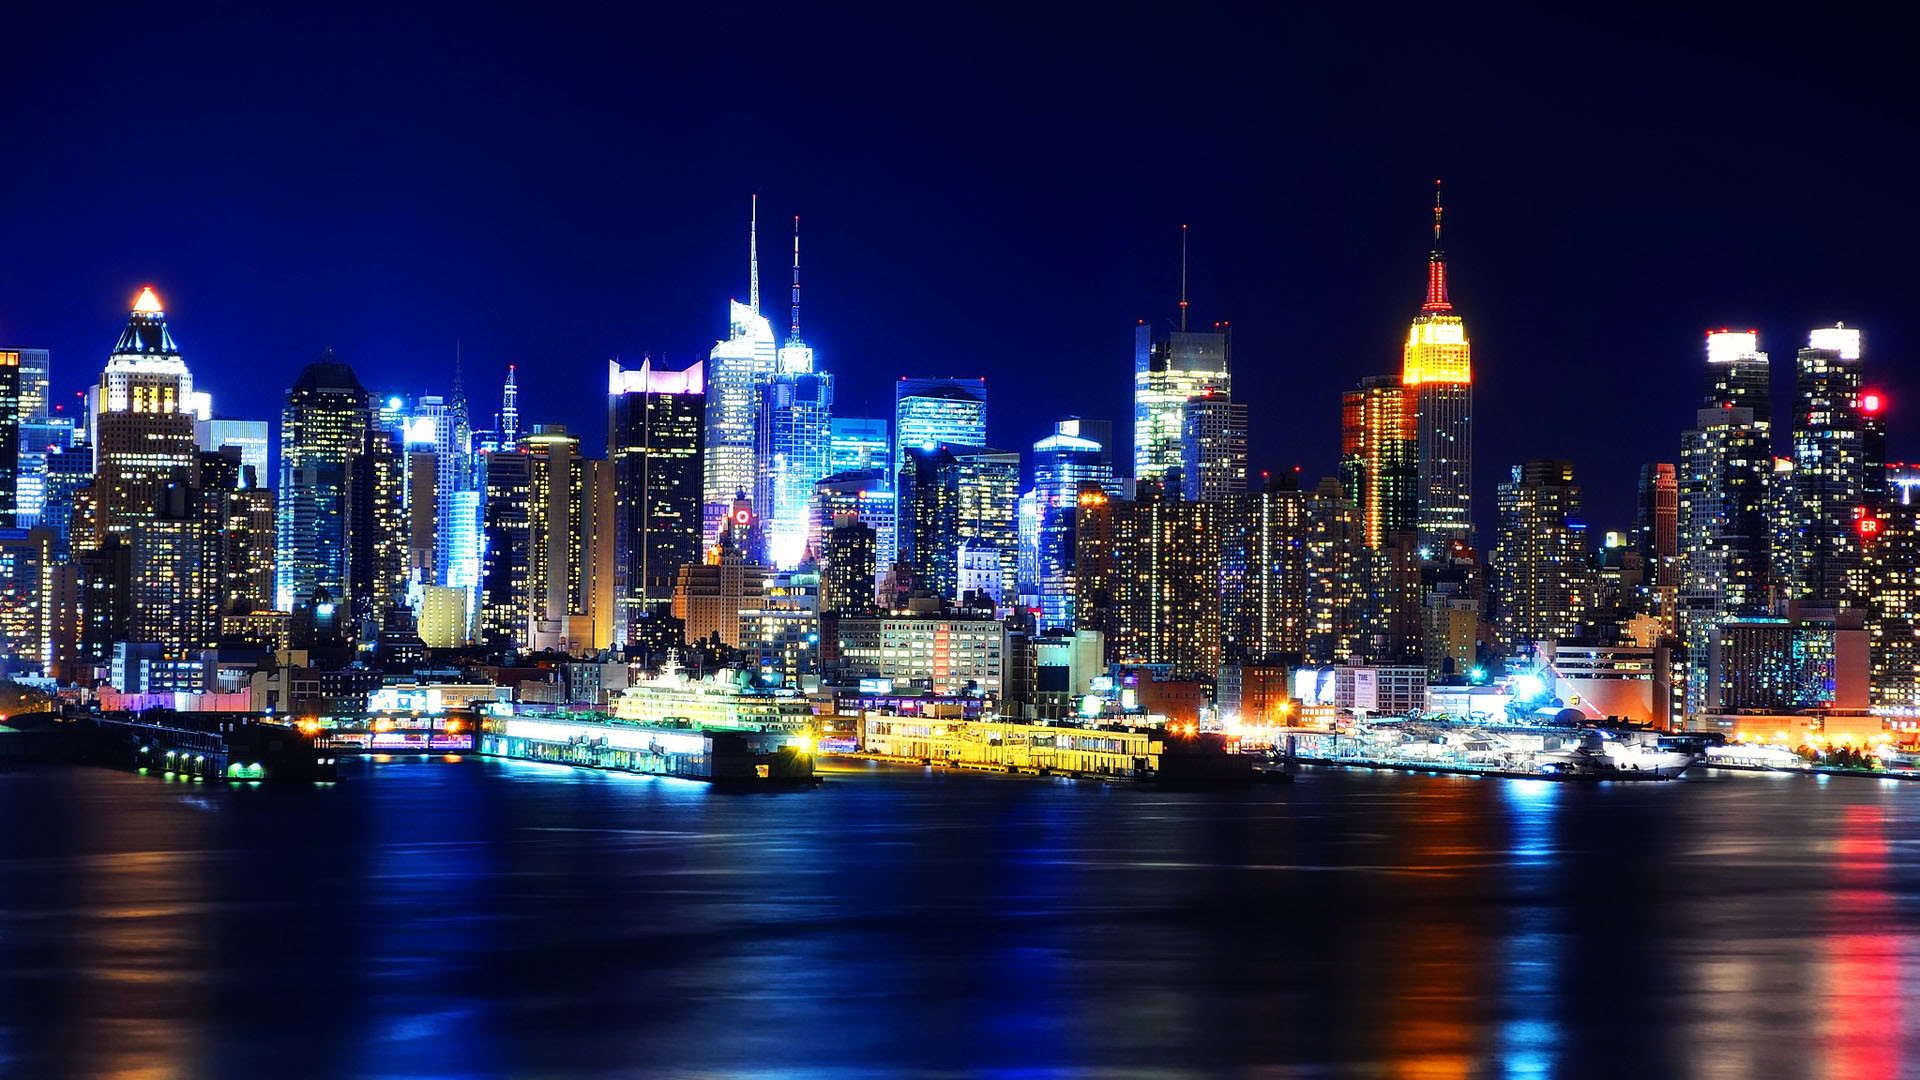 New York Desktop Background 68 Pictures